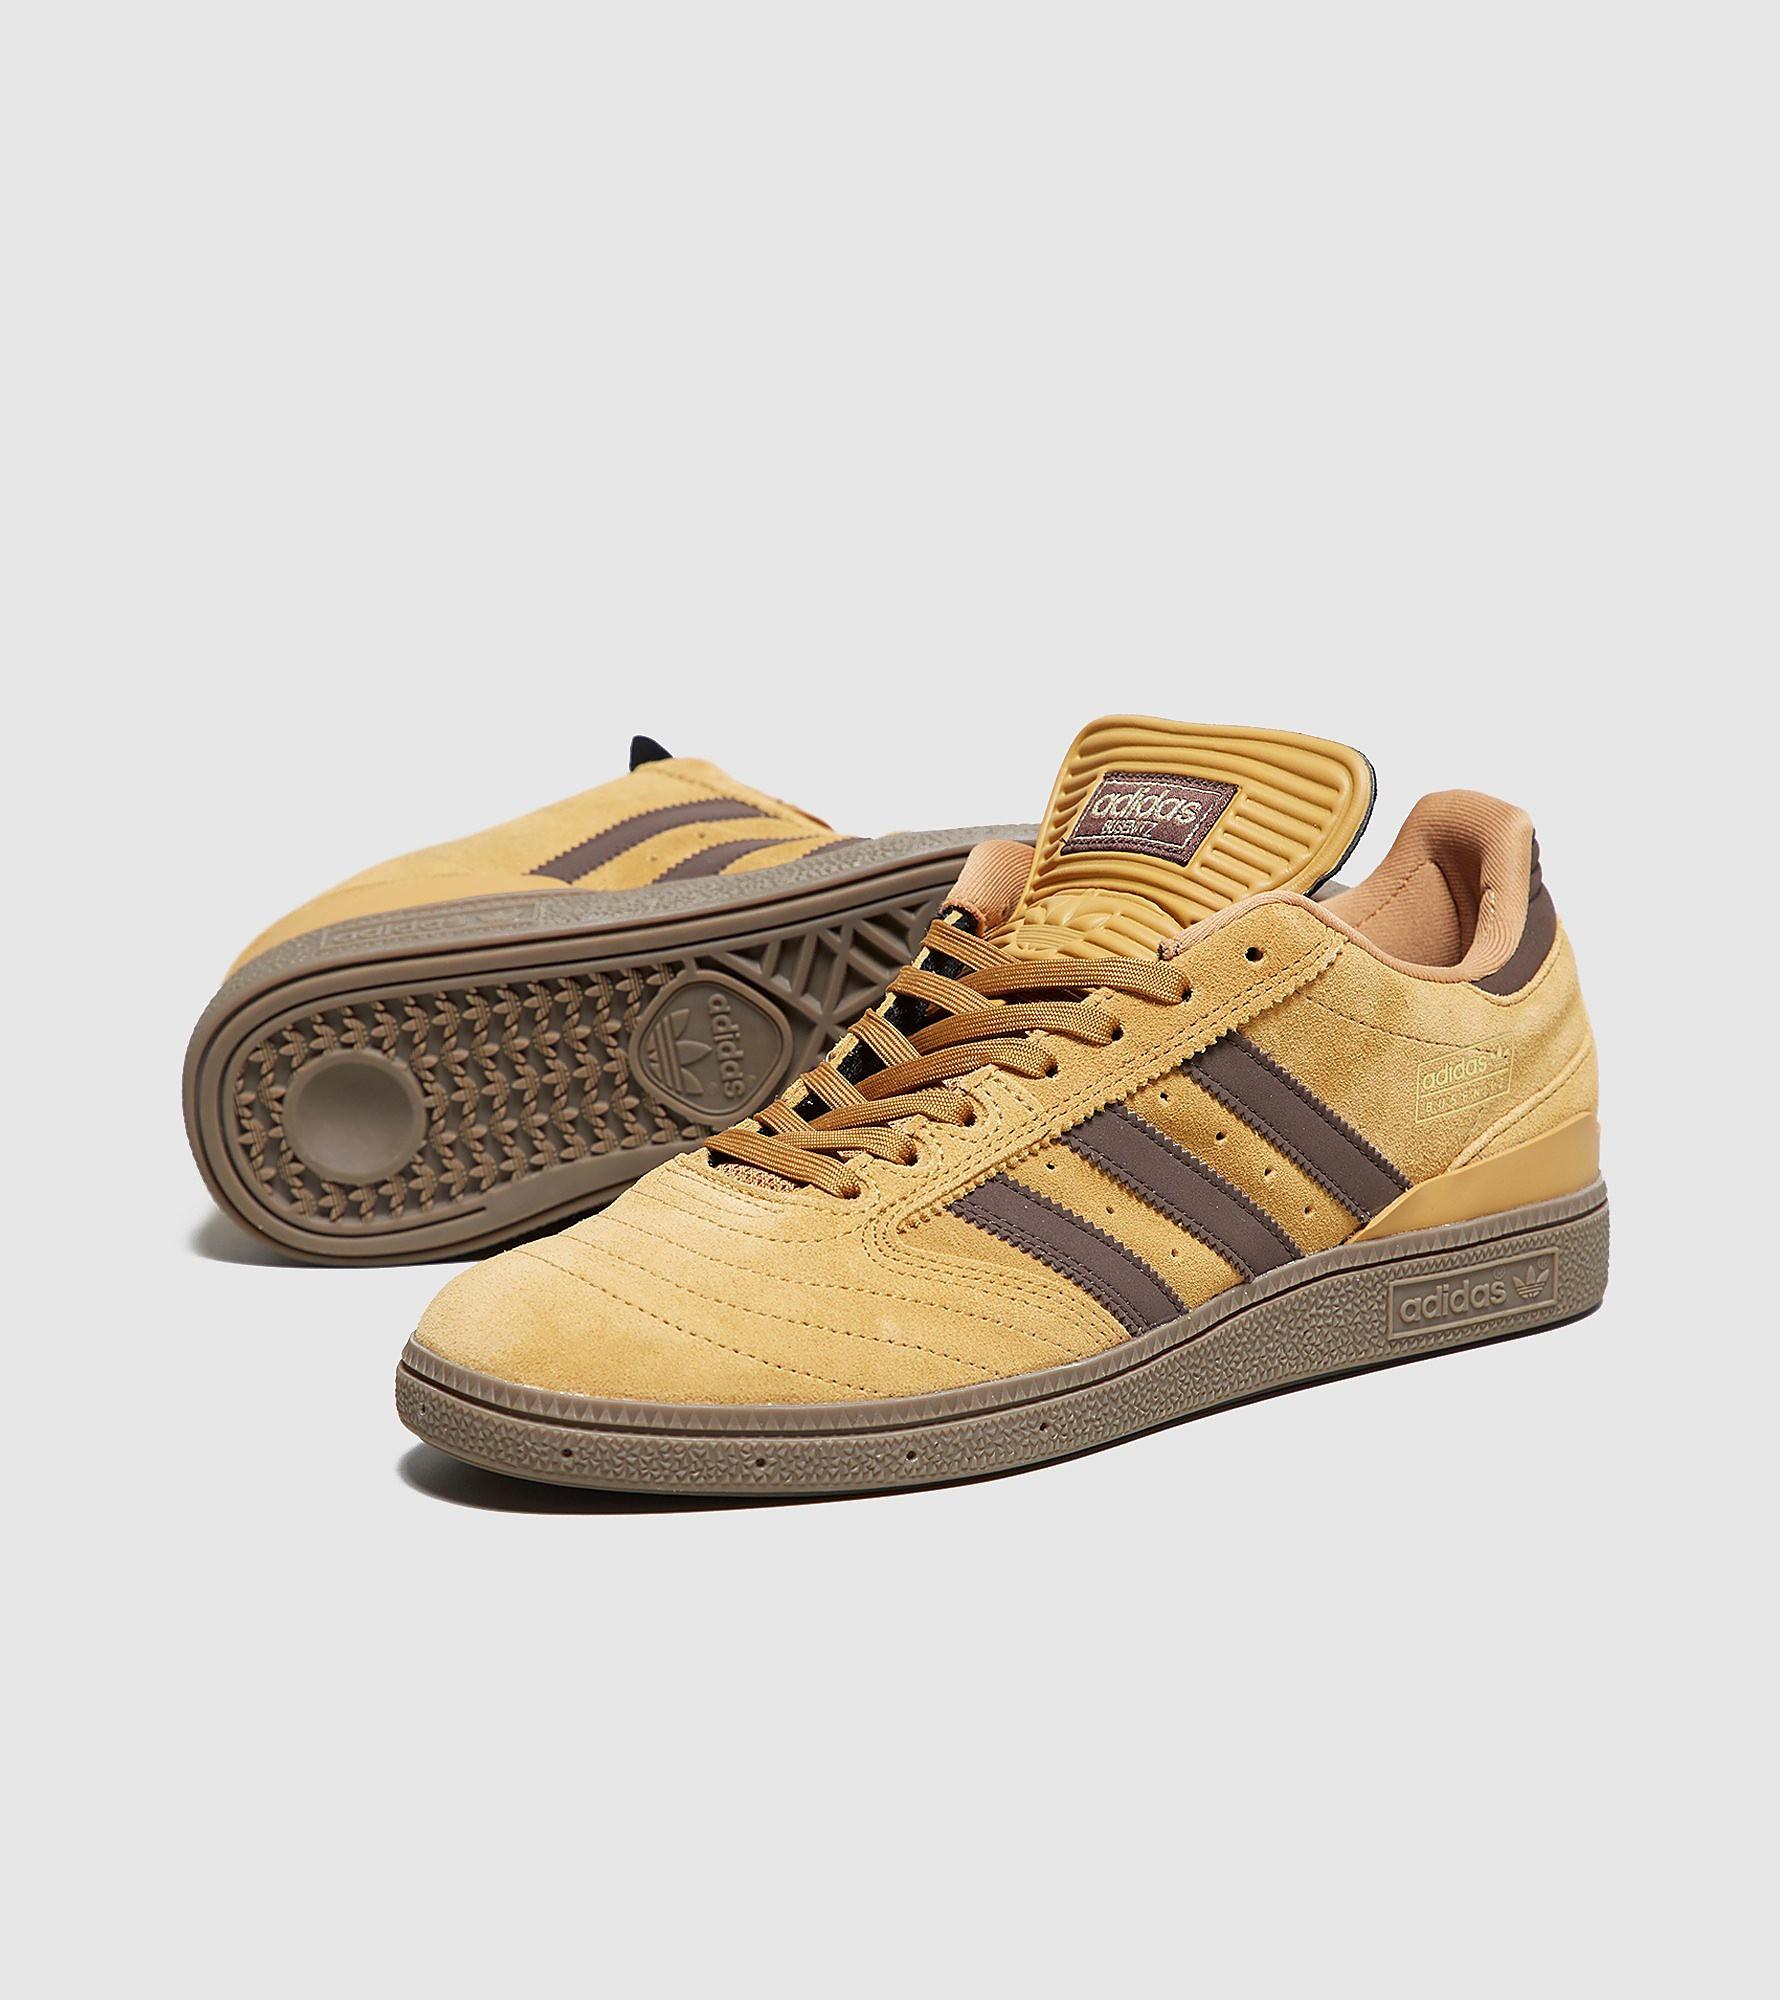 adidas Originals Busenitz Suede